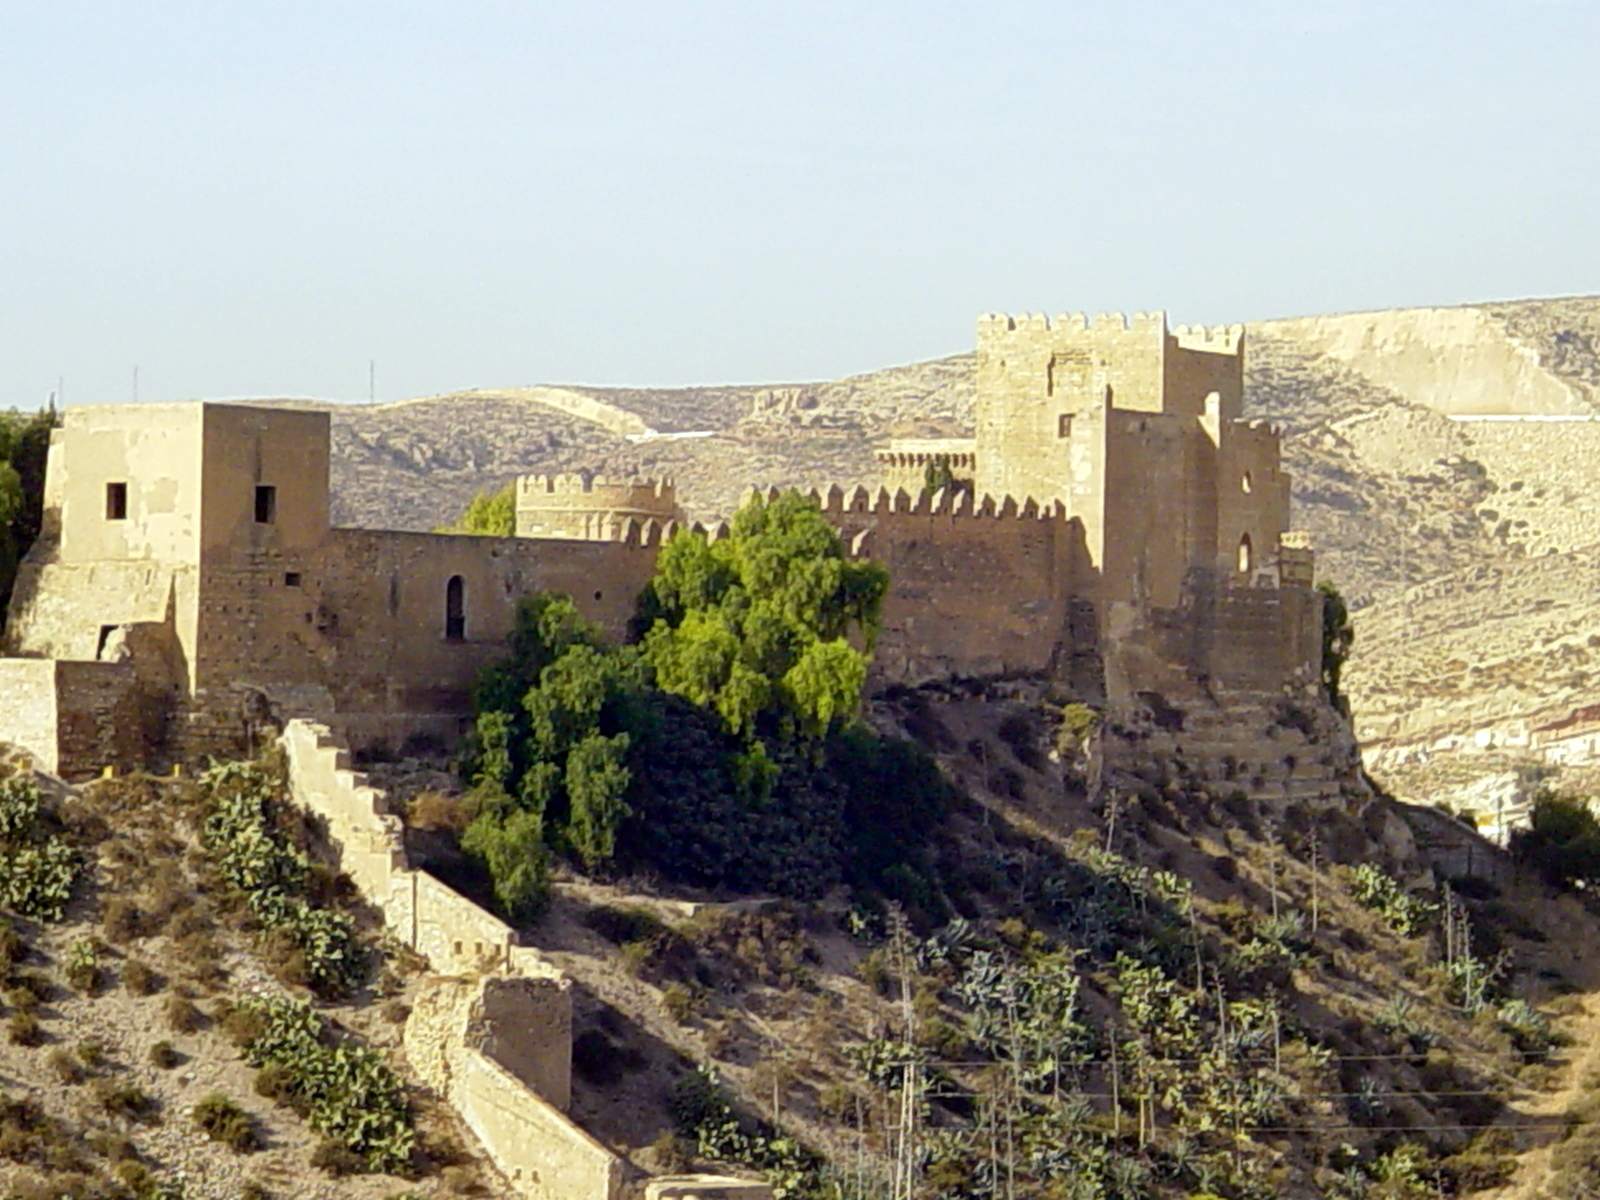 SPANISH IMPRESSIONS: The Alcazaba Almería